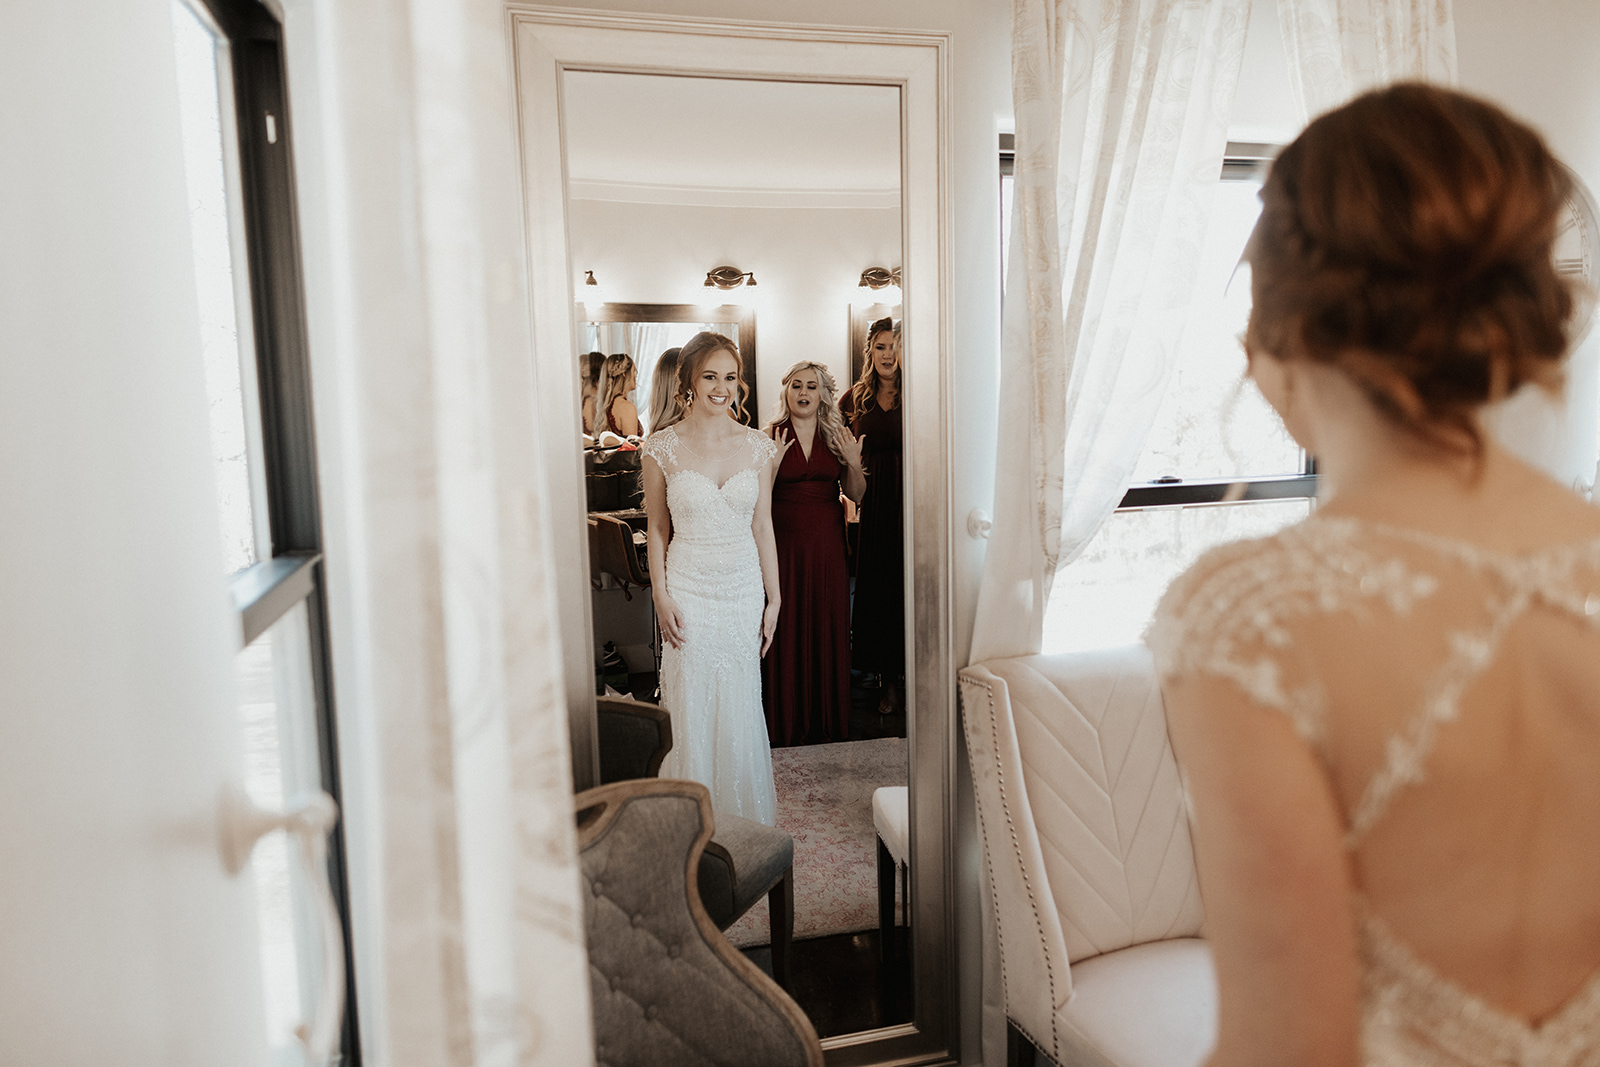 Best Wedding Venue in Tulsa Bixby Dream Point Ranch 10a.jpg